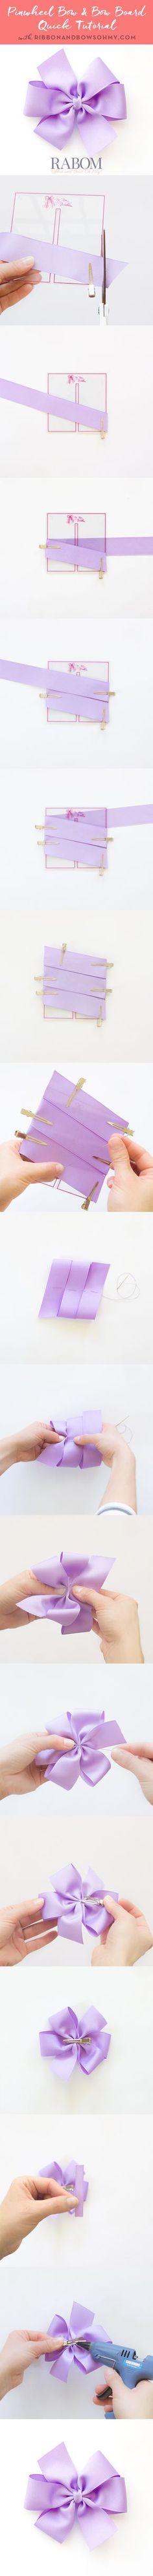 Rabom Pinwheel Bow + Bow Board Pinnable Tutorial! ribbonandbowsohmy.com